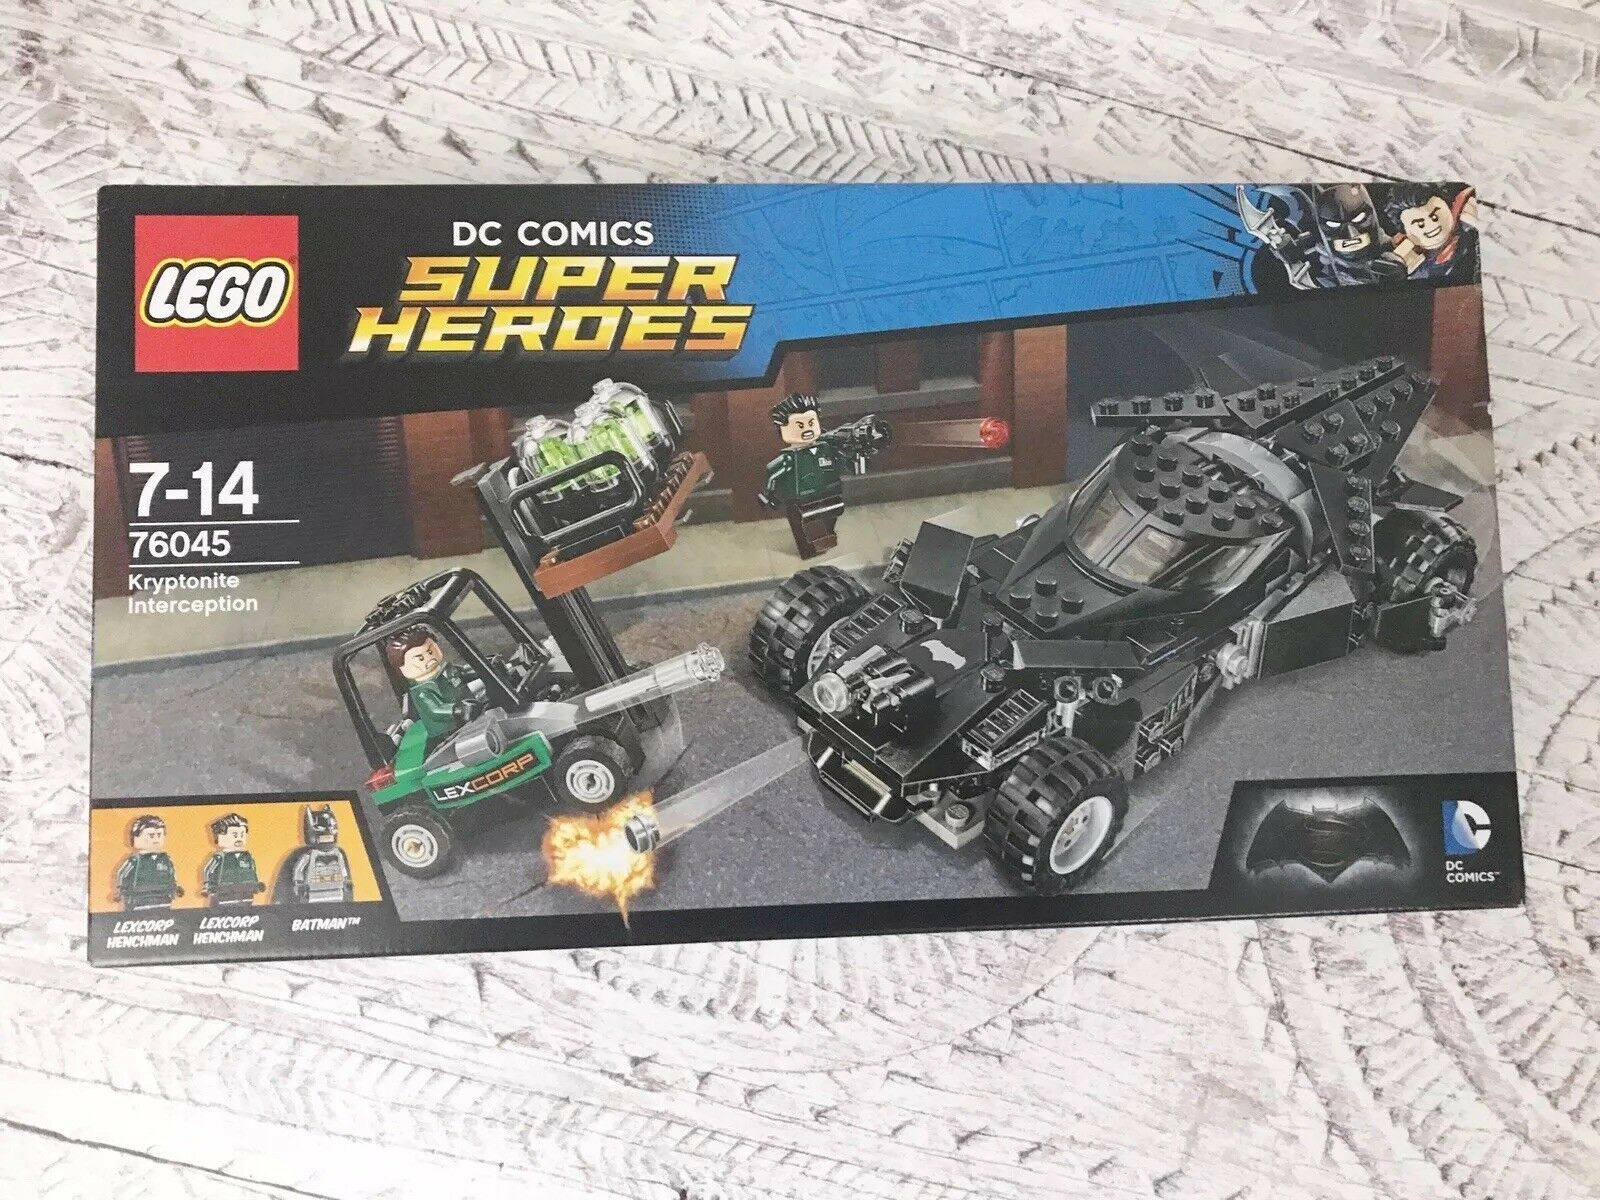 Lego DC Super Heroes Kryptonite Interception with Batman & Batmobile 76045 – NEW